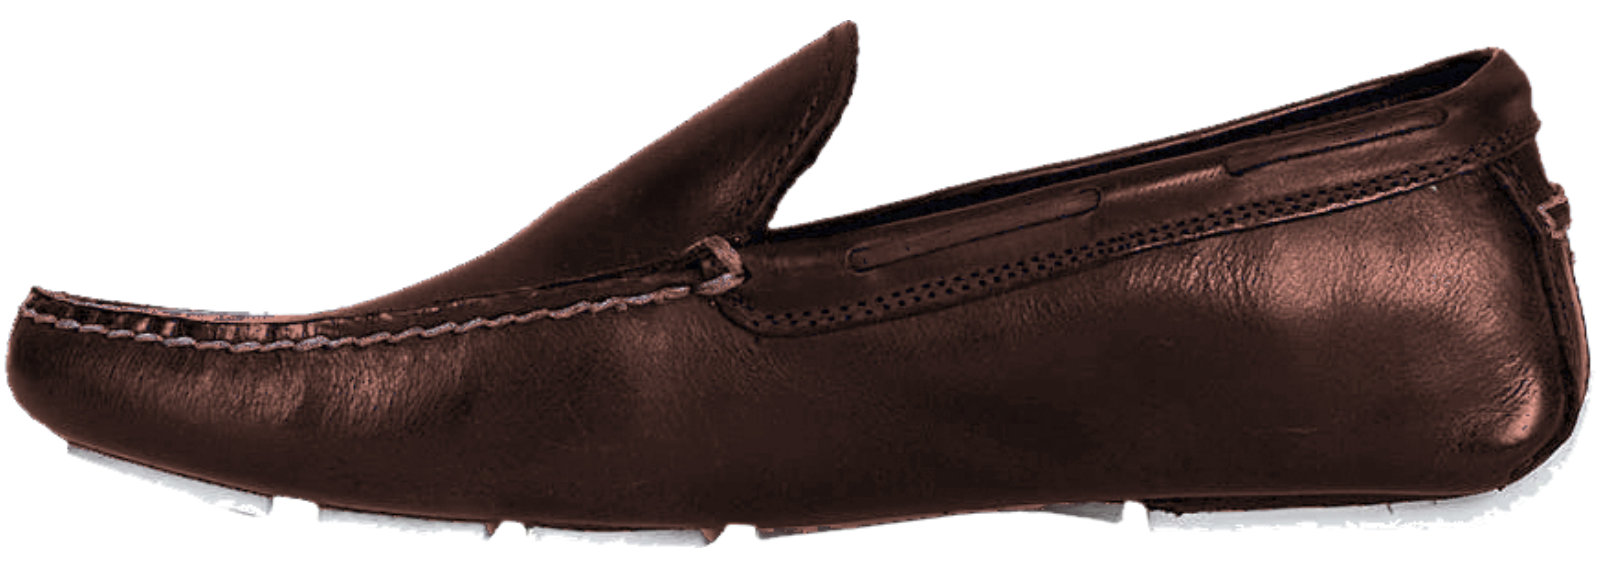 Details zu TIMBERLAND Herren Schuhe Slip on Mokkassins Slipper Heritage Driver Venetian CA1